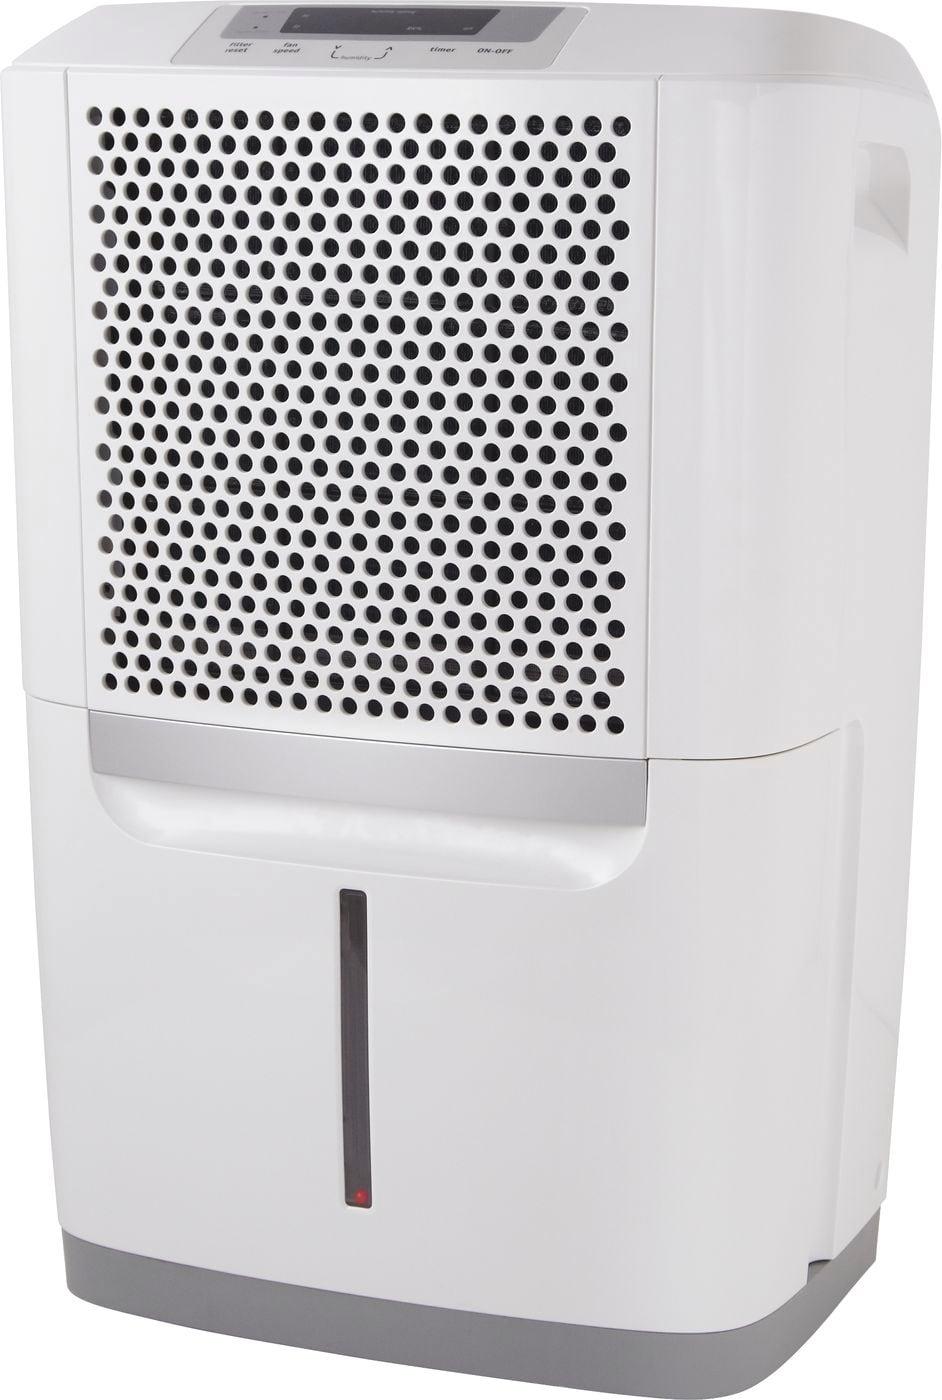 Model: FAD704DWDE | Frigidaire 70 Pint Capacity Dehumidifier